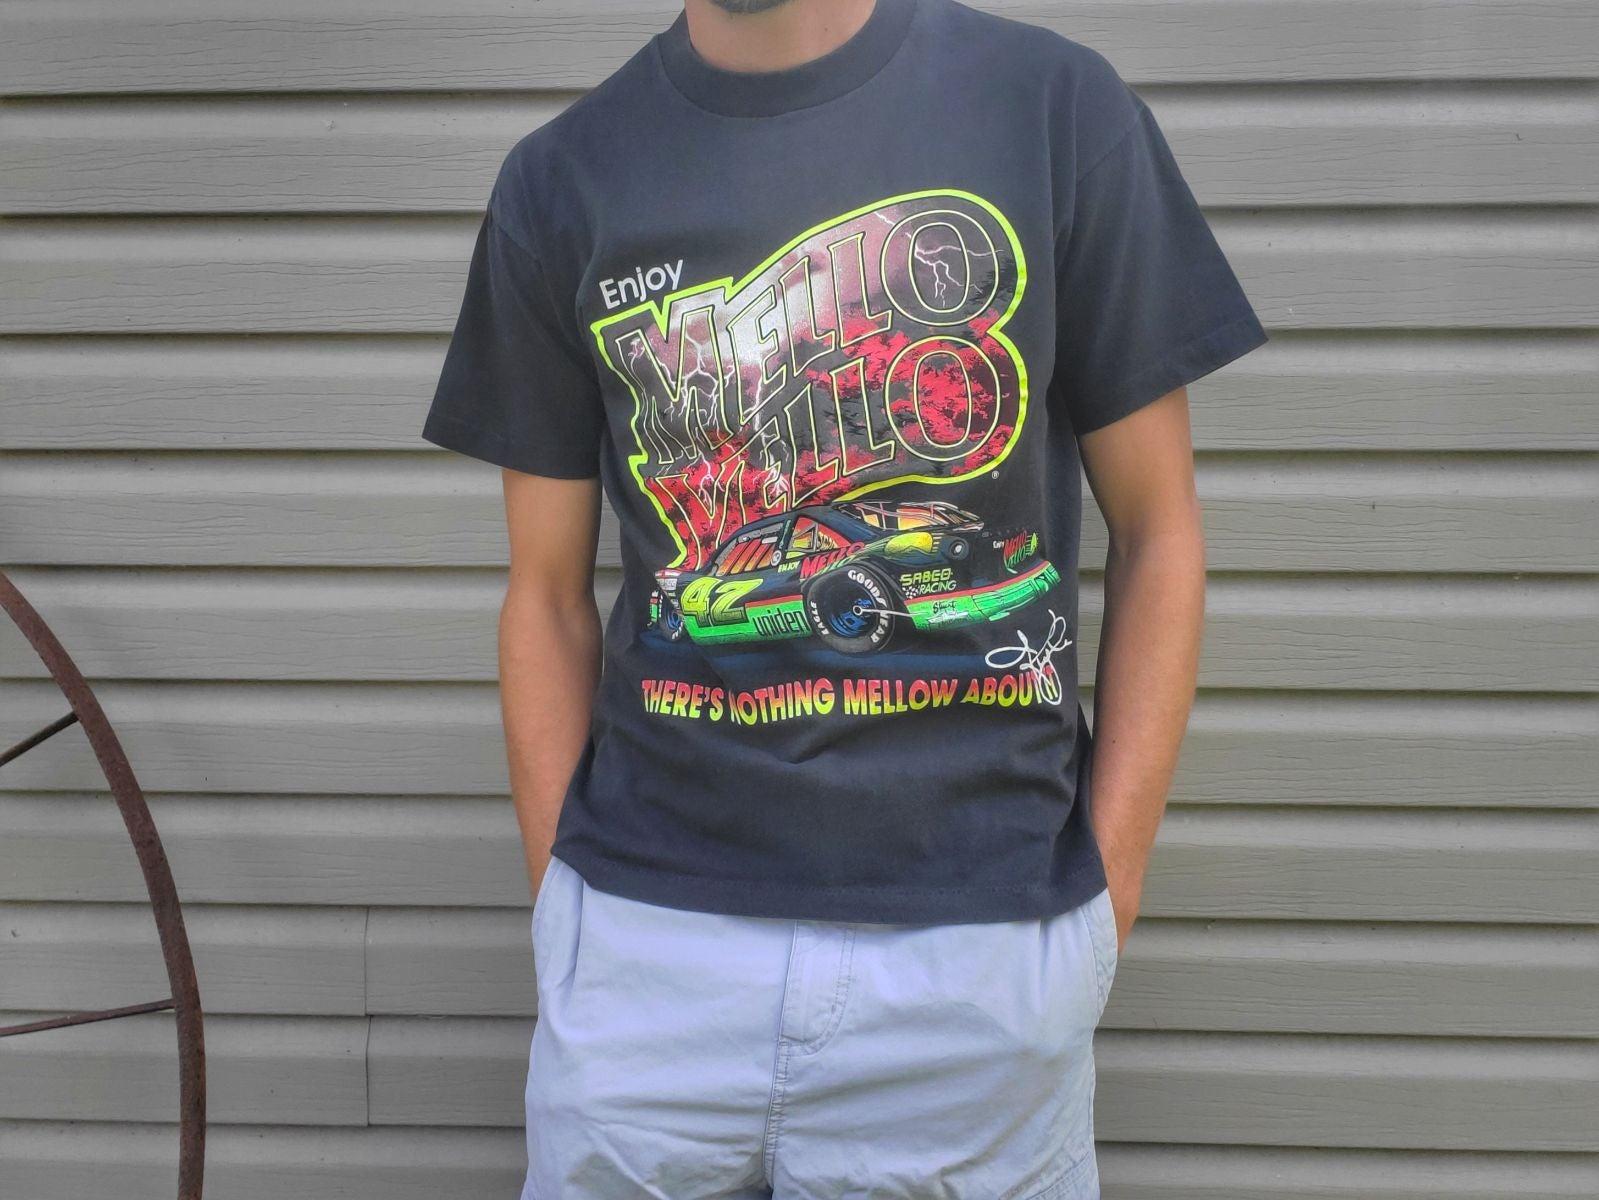 VTG 1992 Mello Yello Kyle Petty T-Shirt